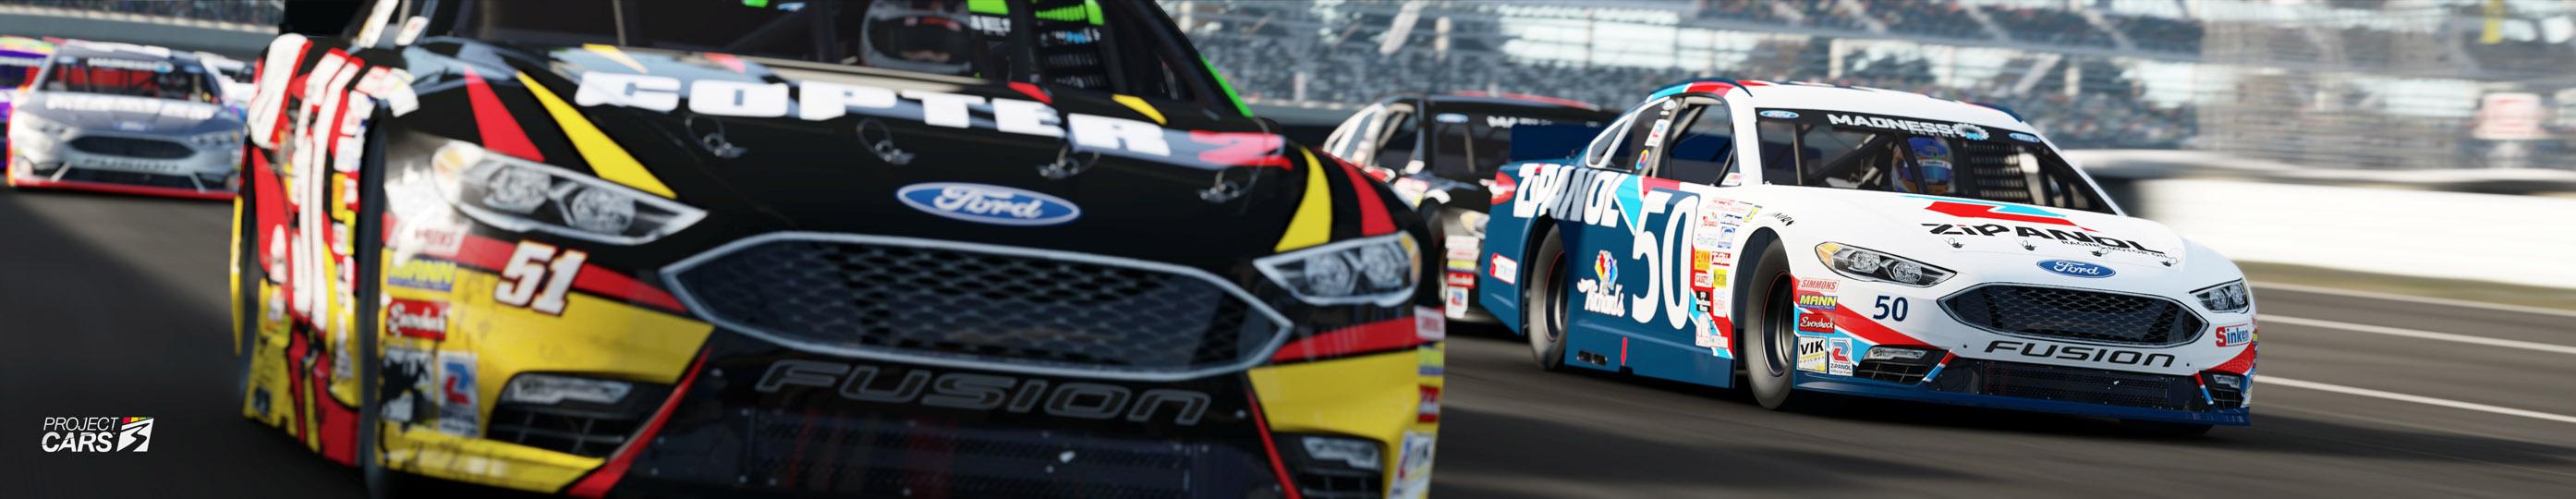 1 PROJECT CARS 3 NASCAR at INDIANAPOLIS crop copy.jpg